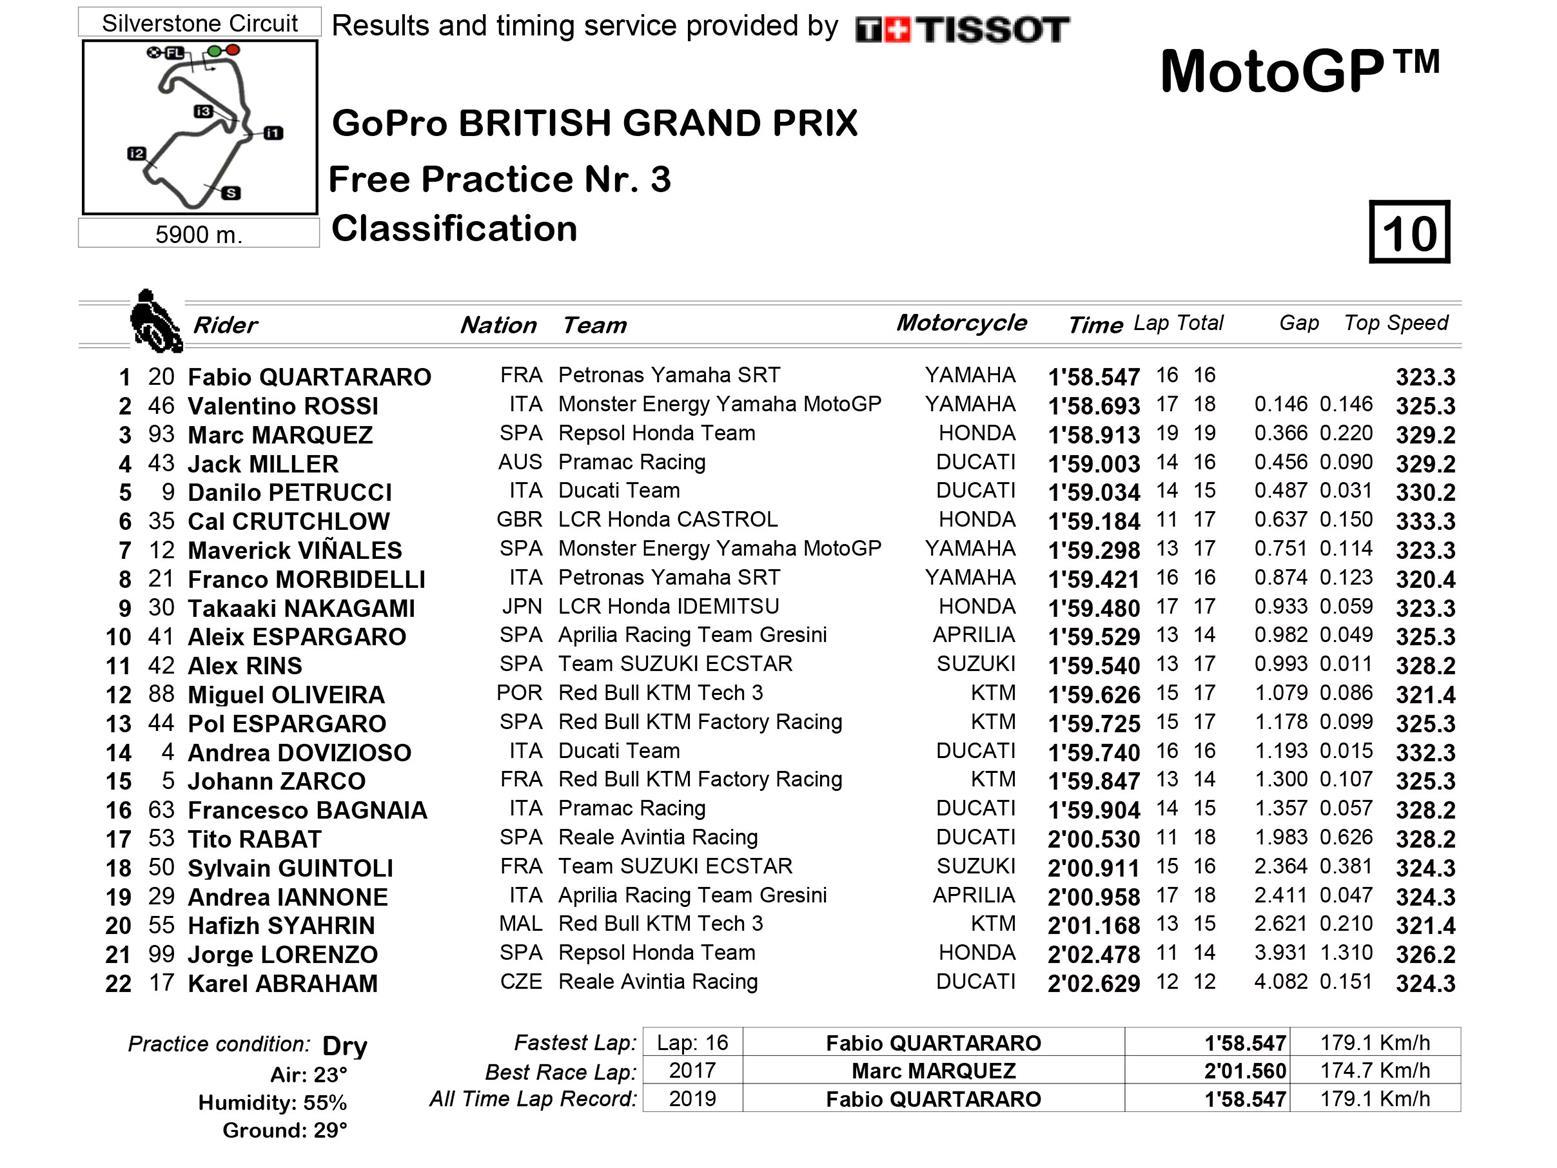 MotoGP FP4 times